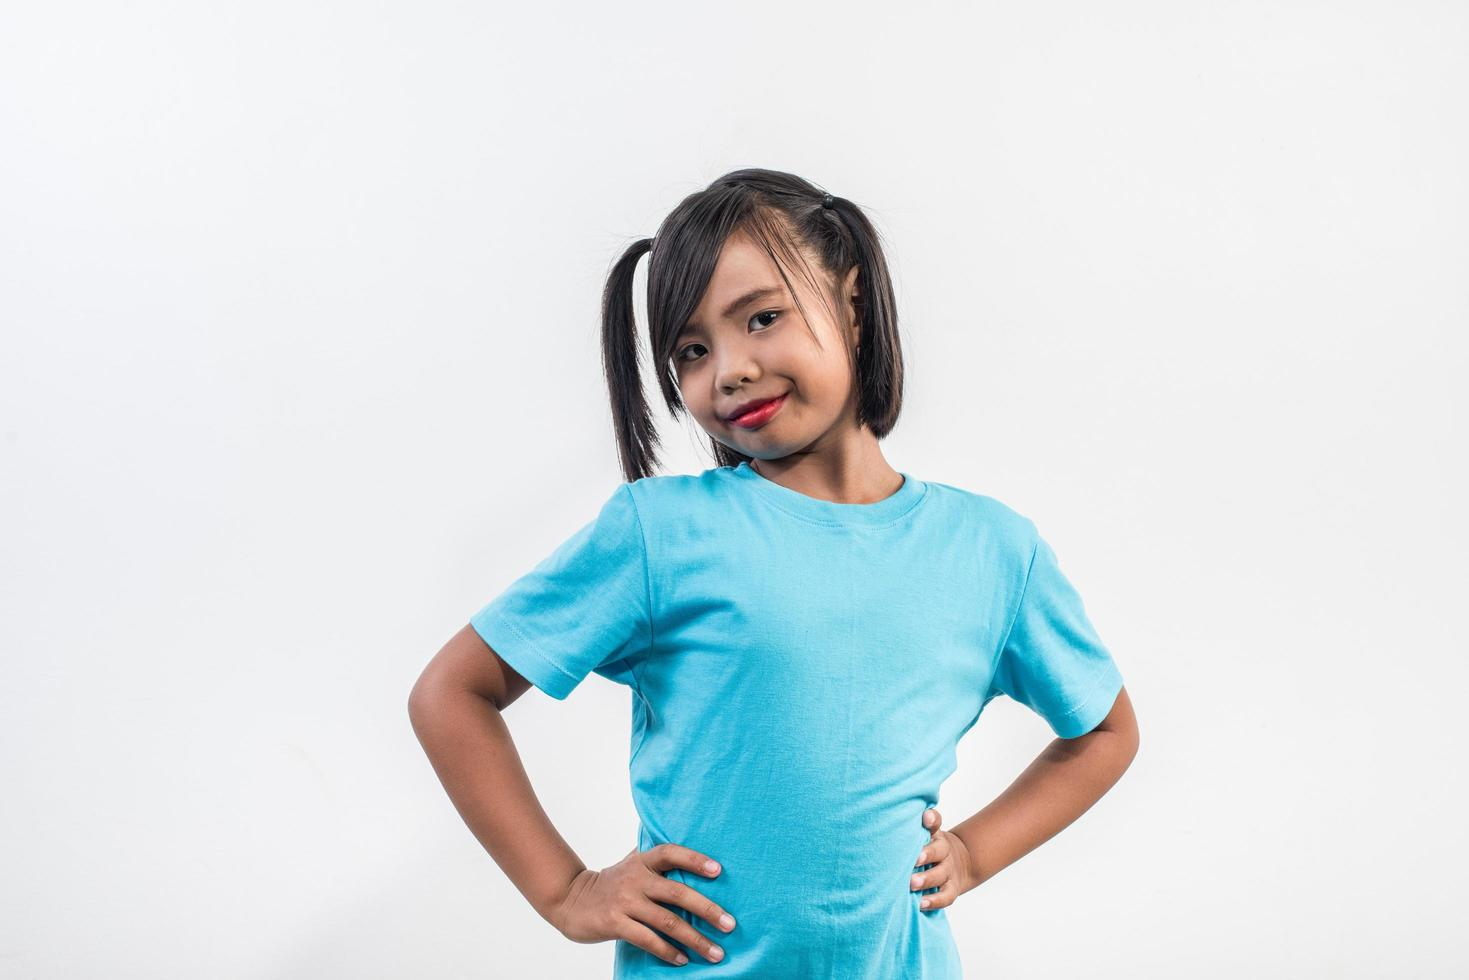 Retrato de niña divertida actuando en tiro de estudio. foto